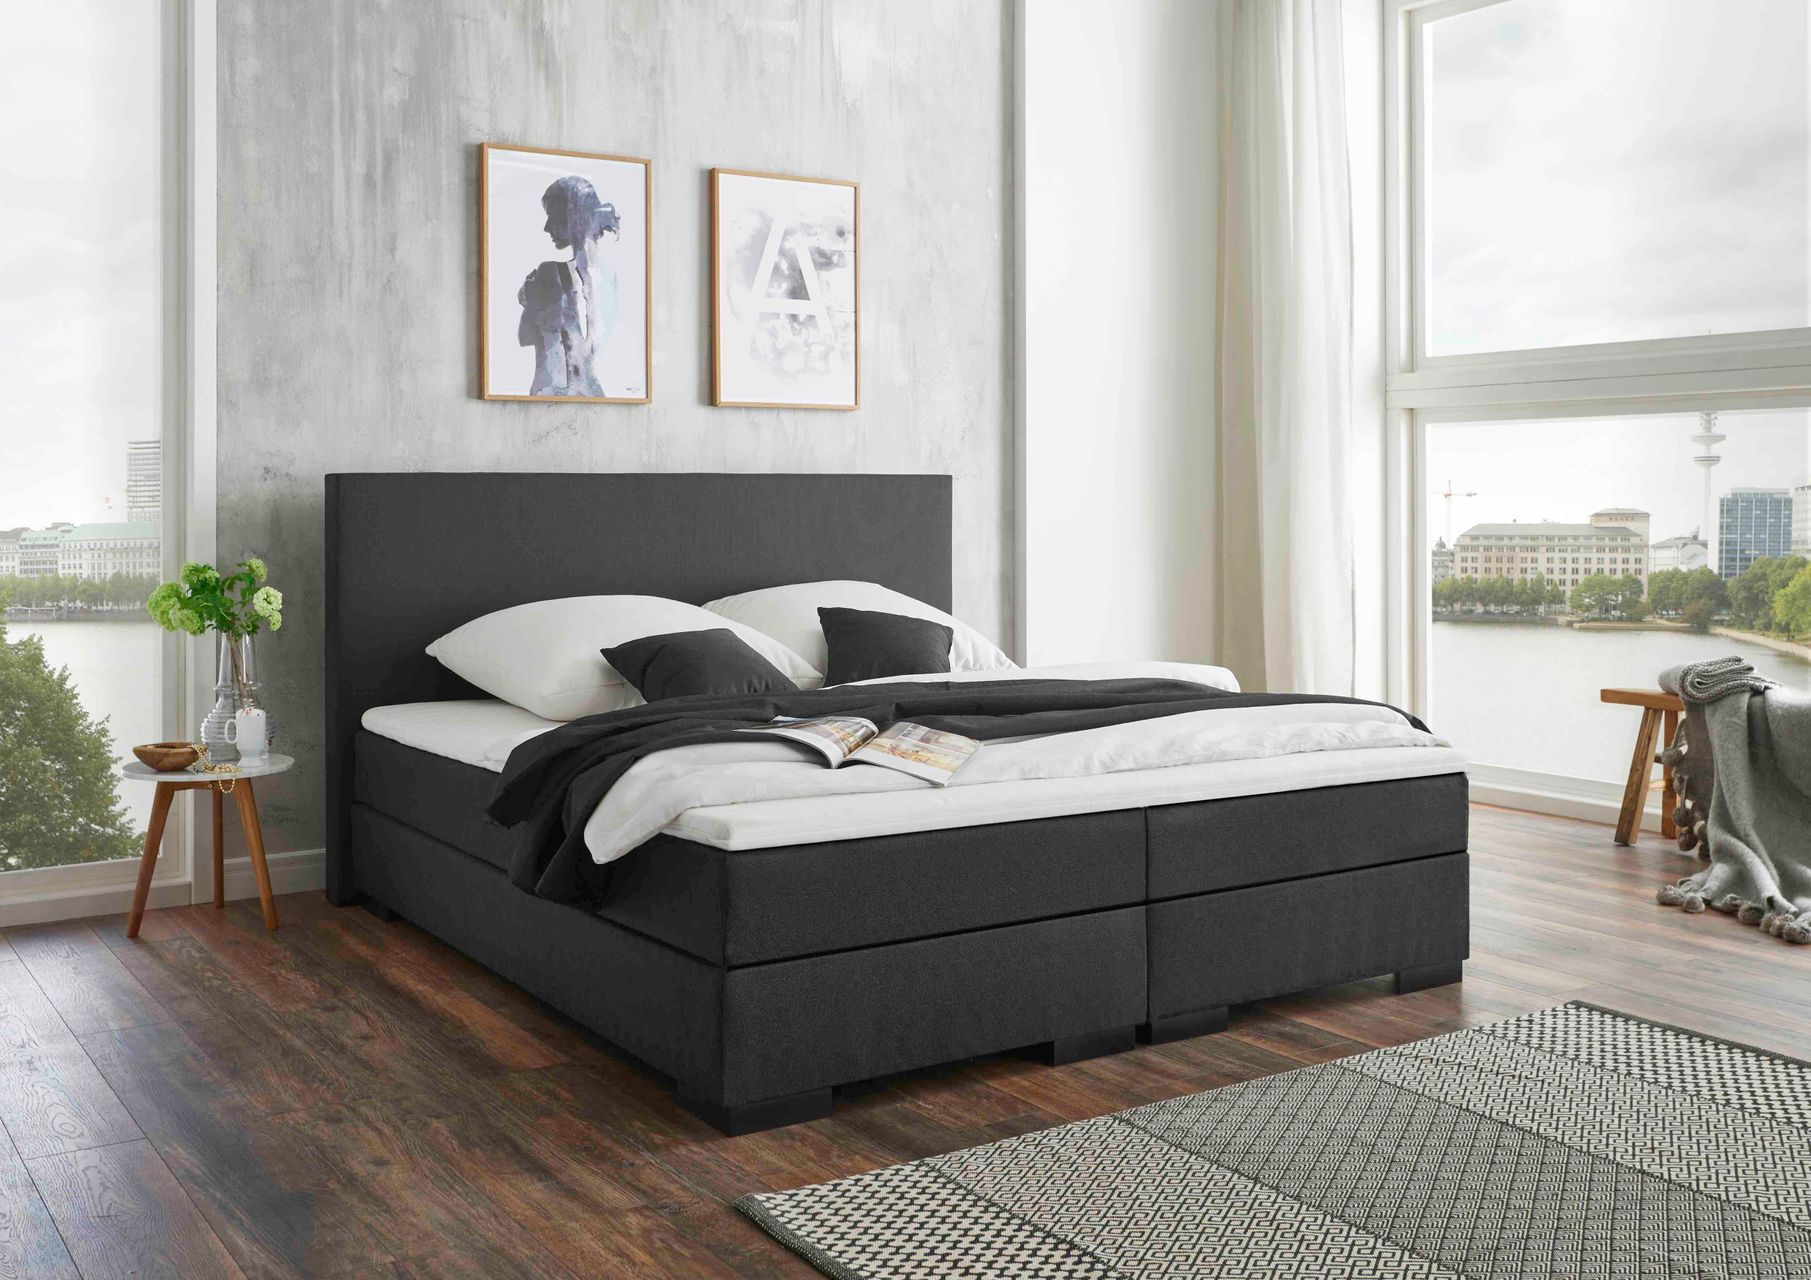 belvandeo verona amerikanisches boxspring bett bonellfederkern matratze h rtegrad h2. Black Bedroom Furniture Sets. Home Design Ideas